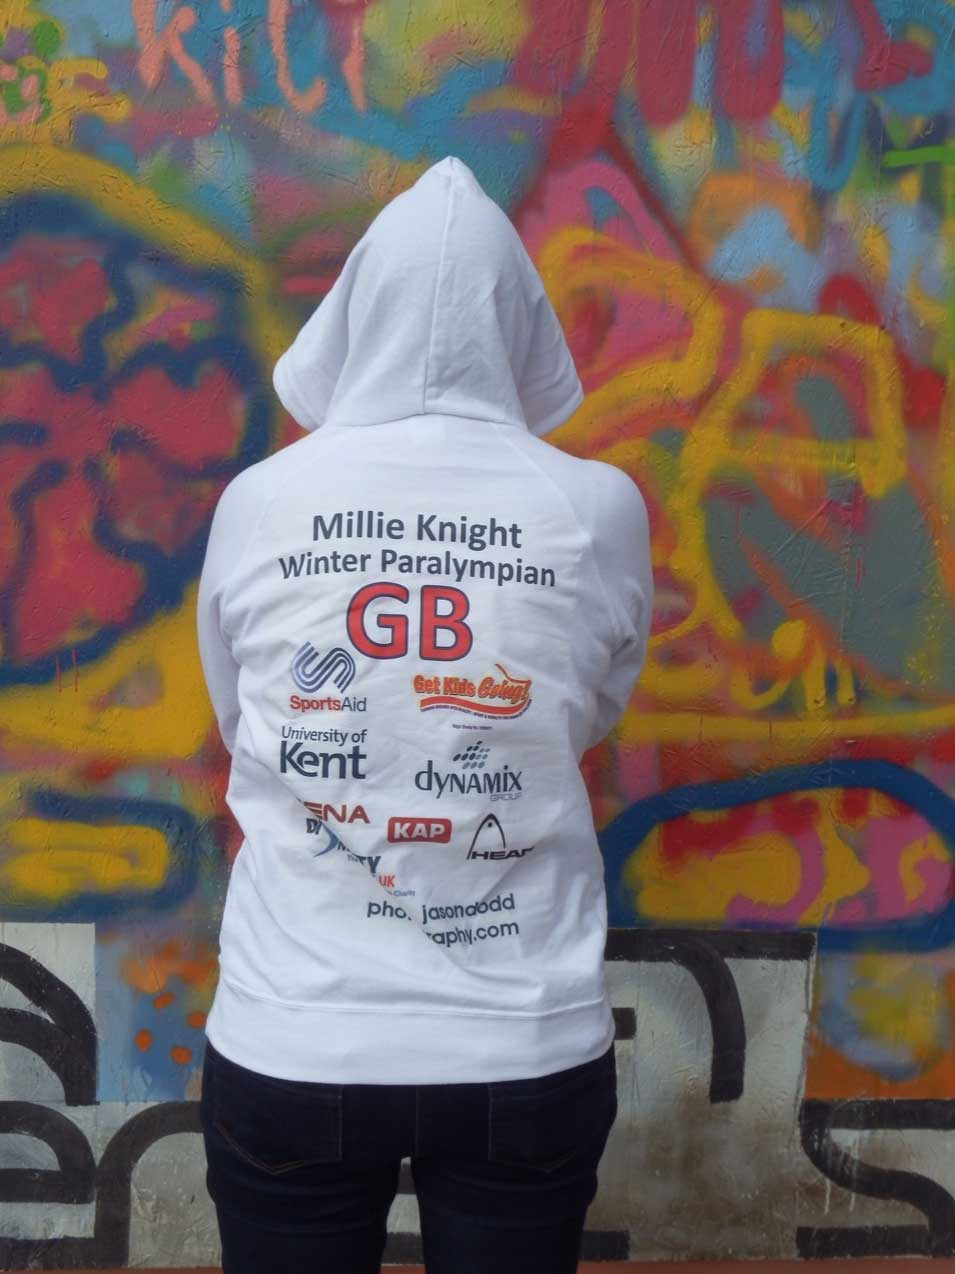 Millie Knight Paralympian skier